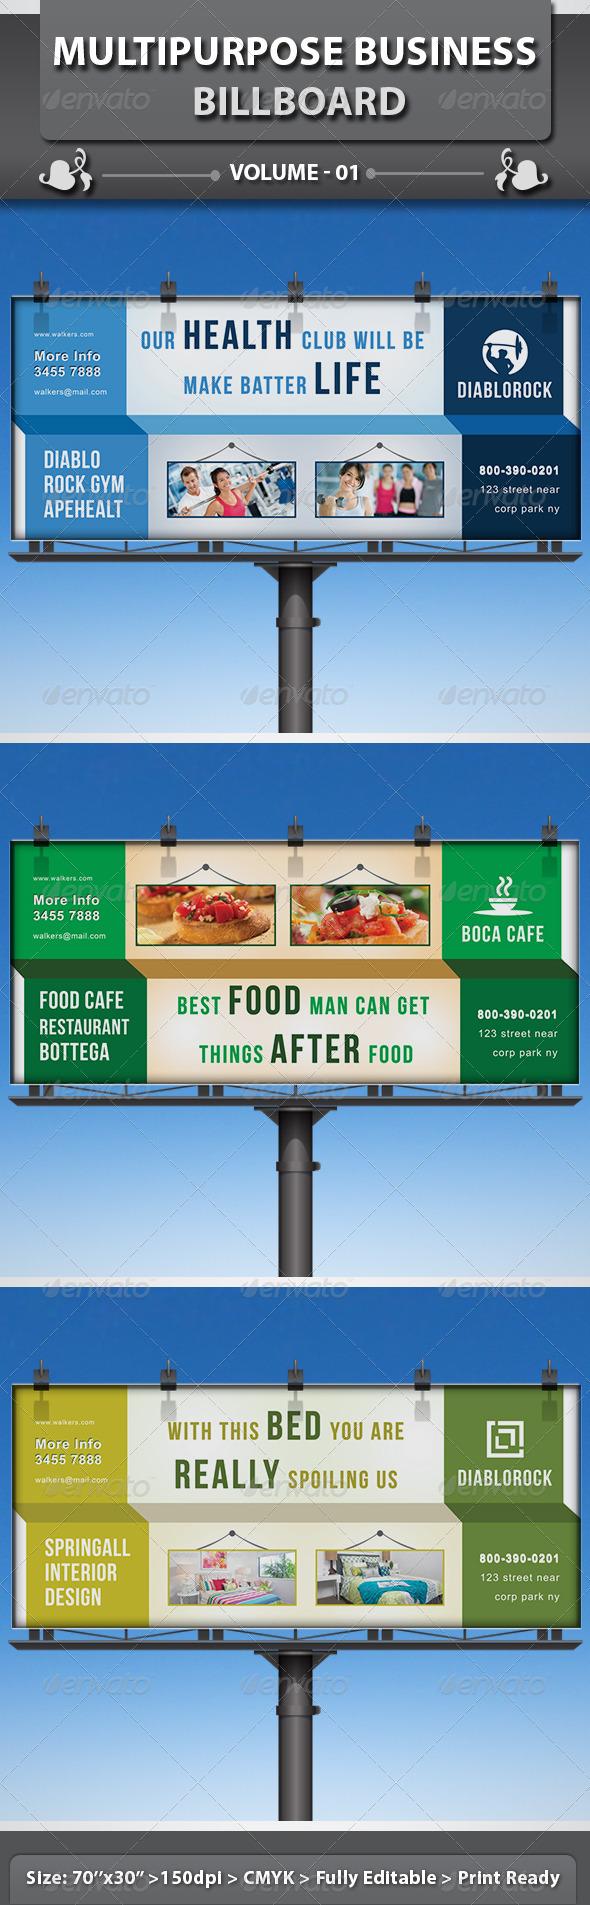 GraphicRiver Multipurpose Business Billboard v1 4978124